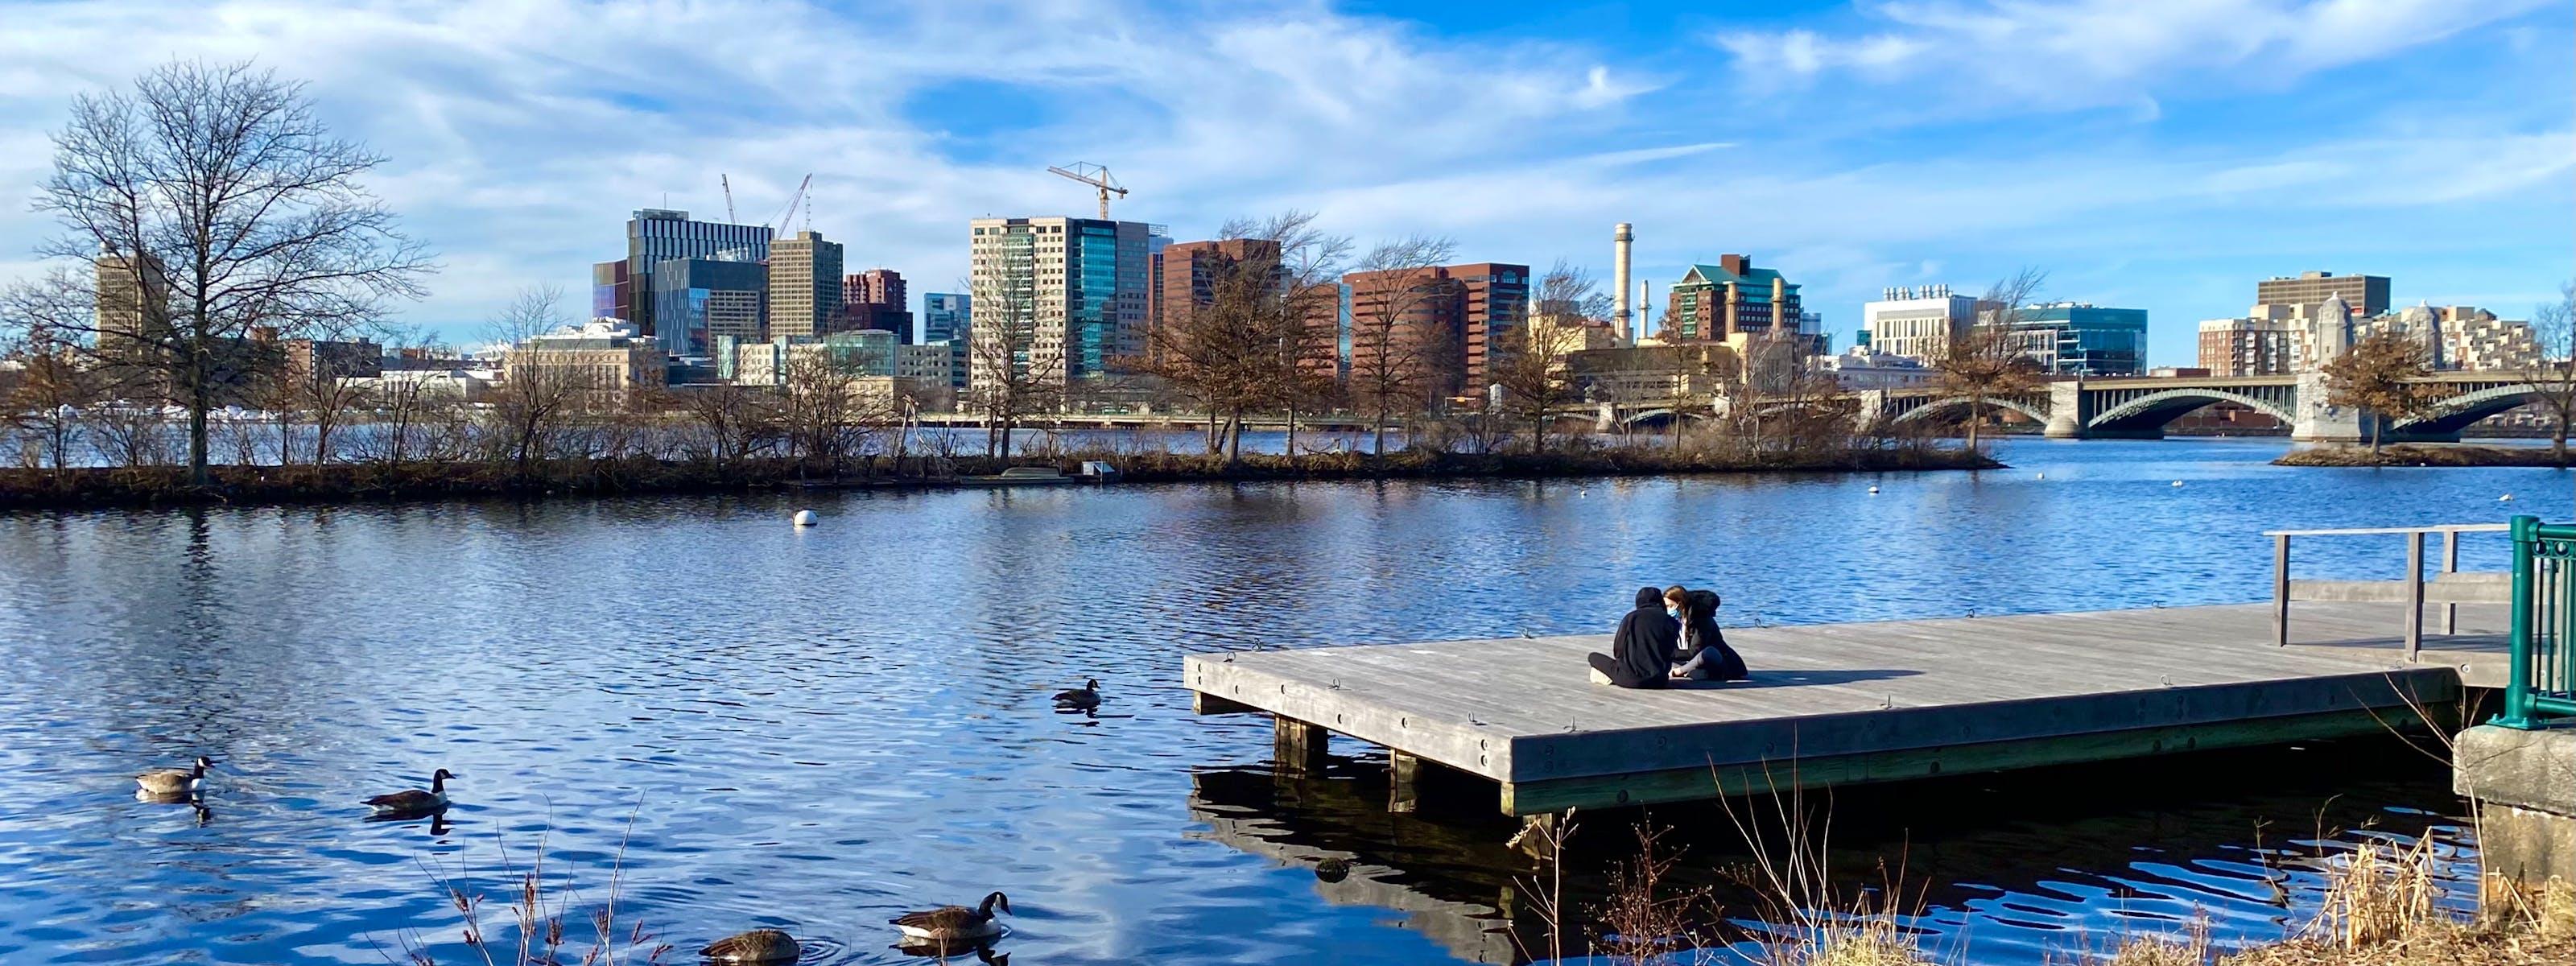 The Boston Winter Activity Guide - Boston - The Infatuation